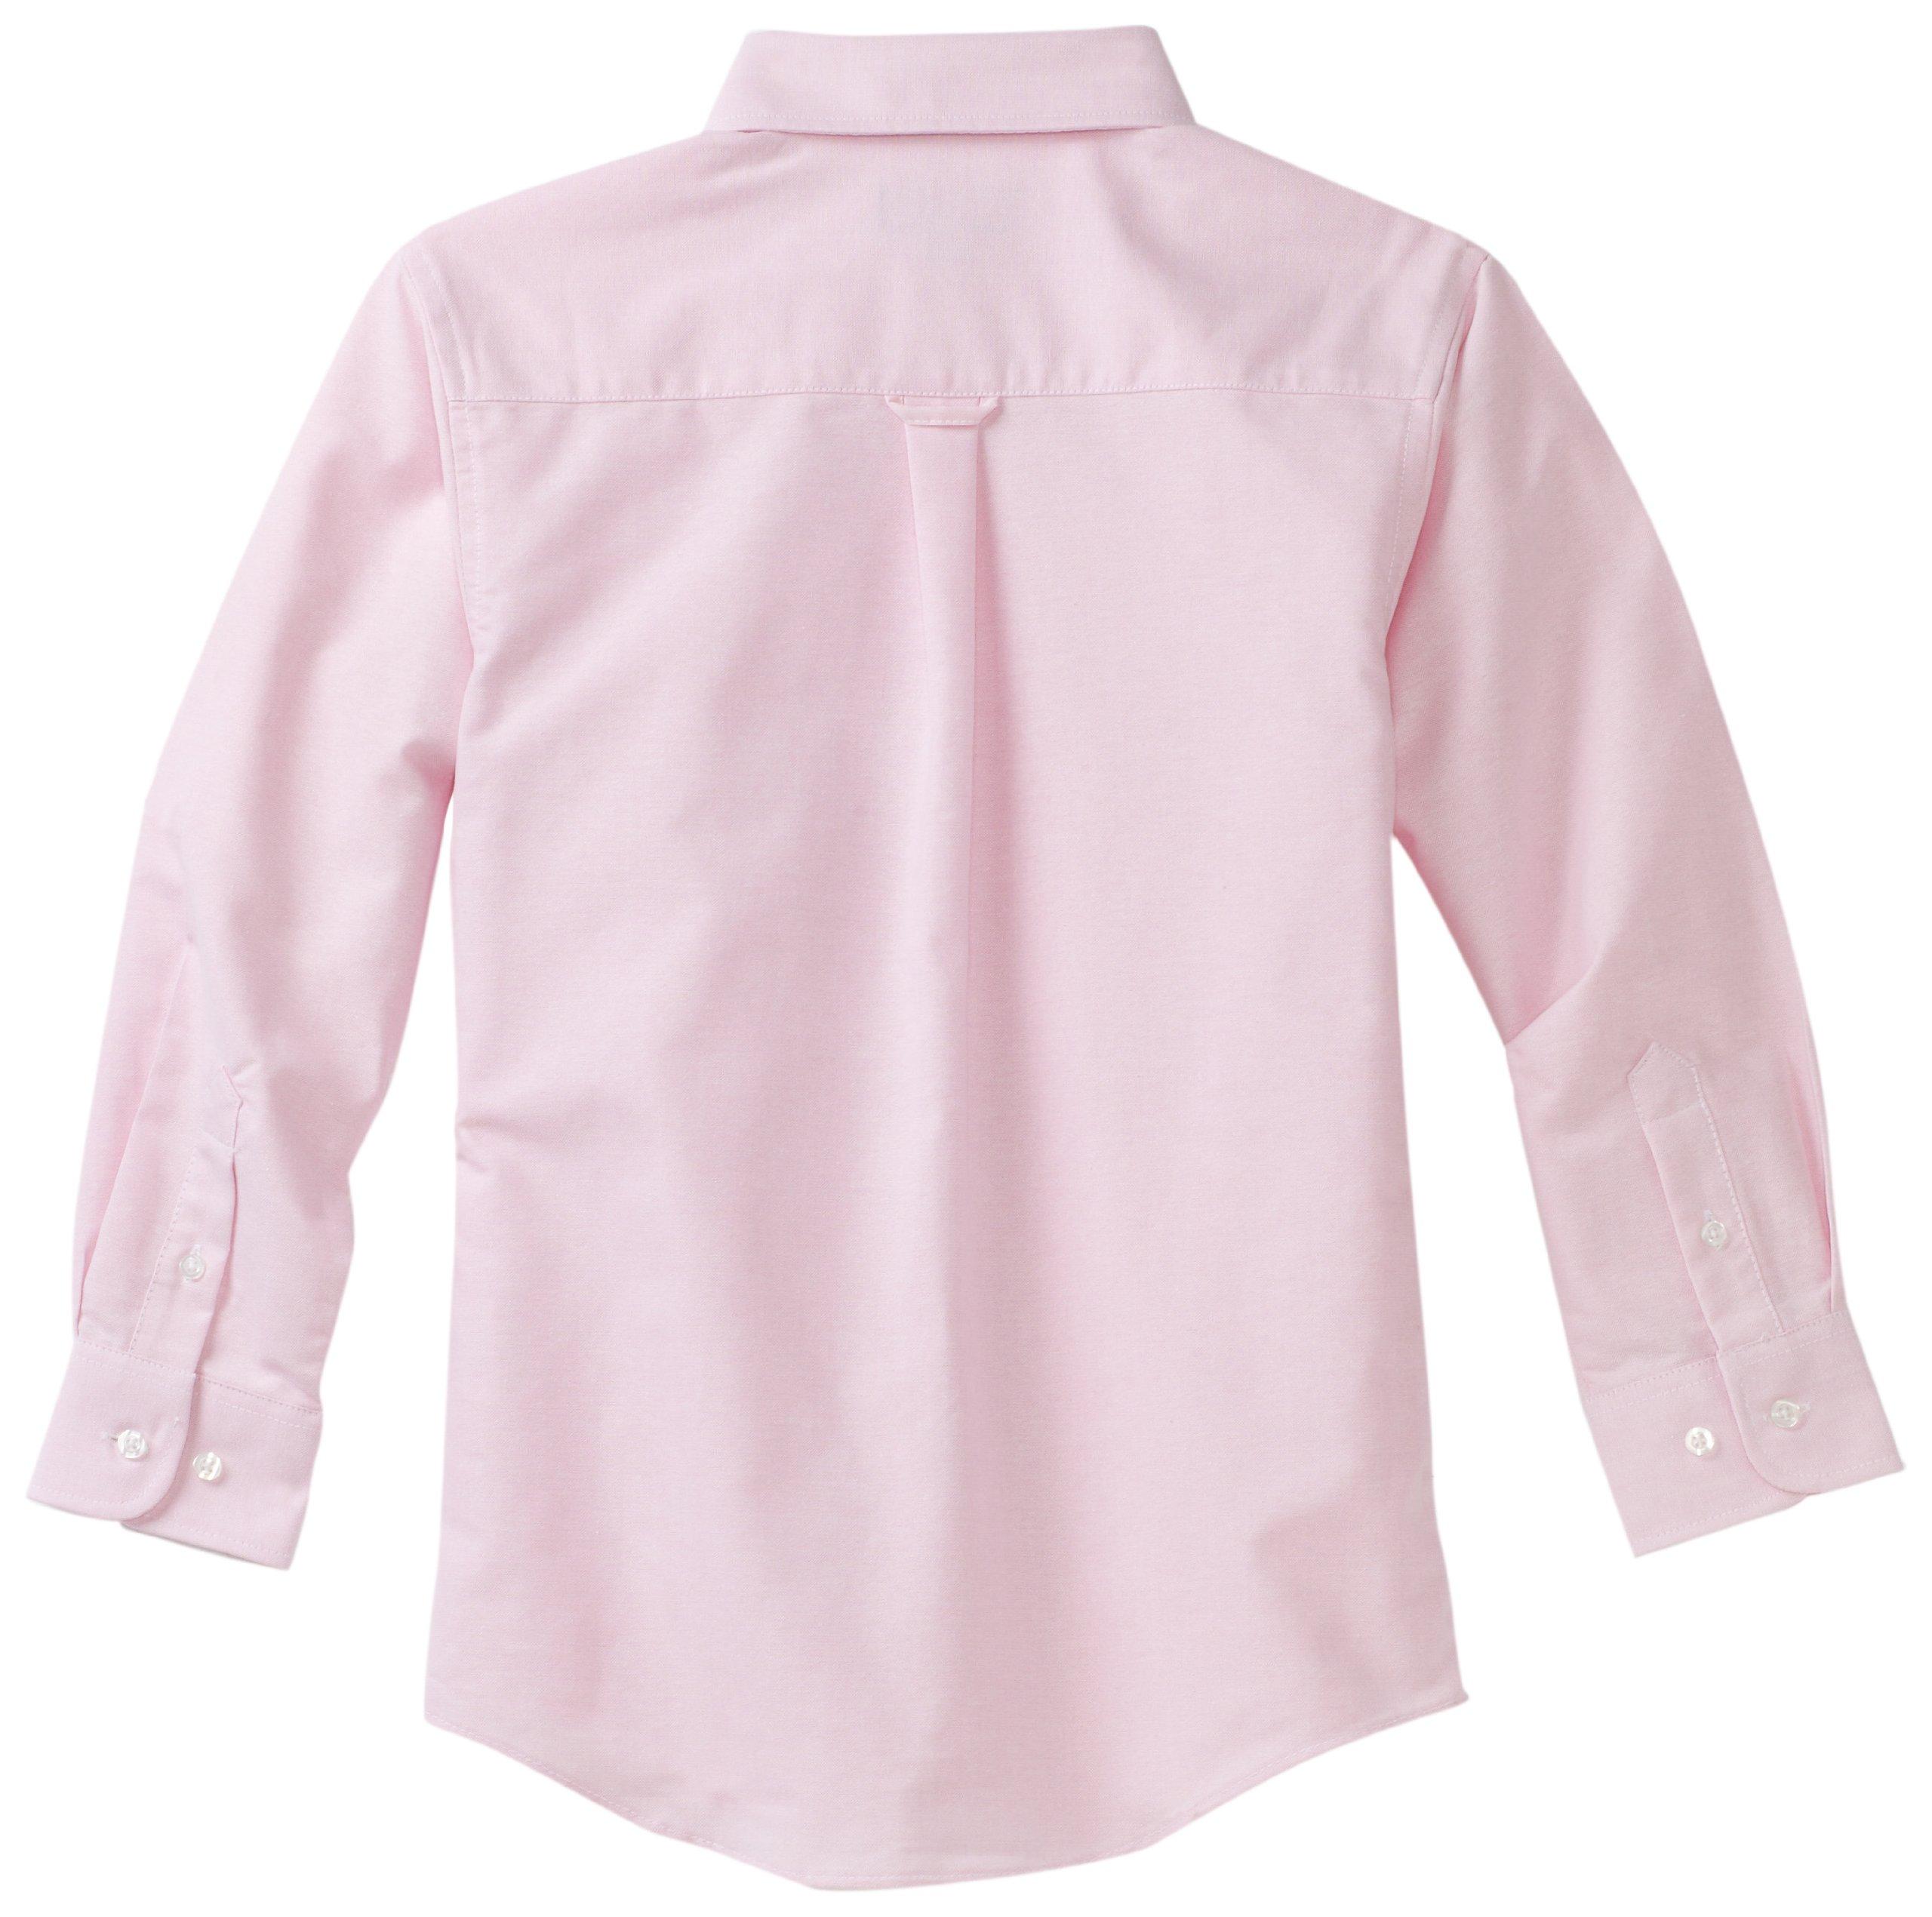 Izod boys Long Sleeve Solid Button-Down Oxford Shirt, Medium Pink, 20 Regular by IZOD (Image #2)